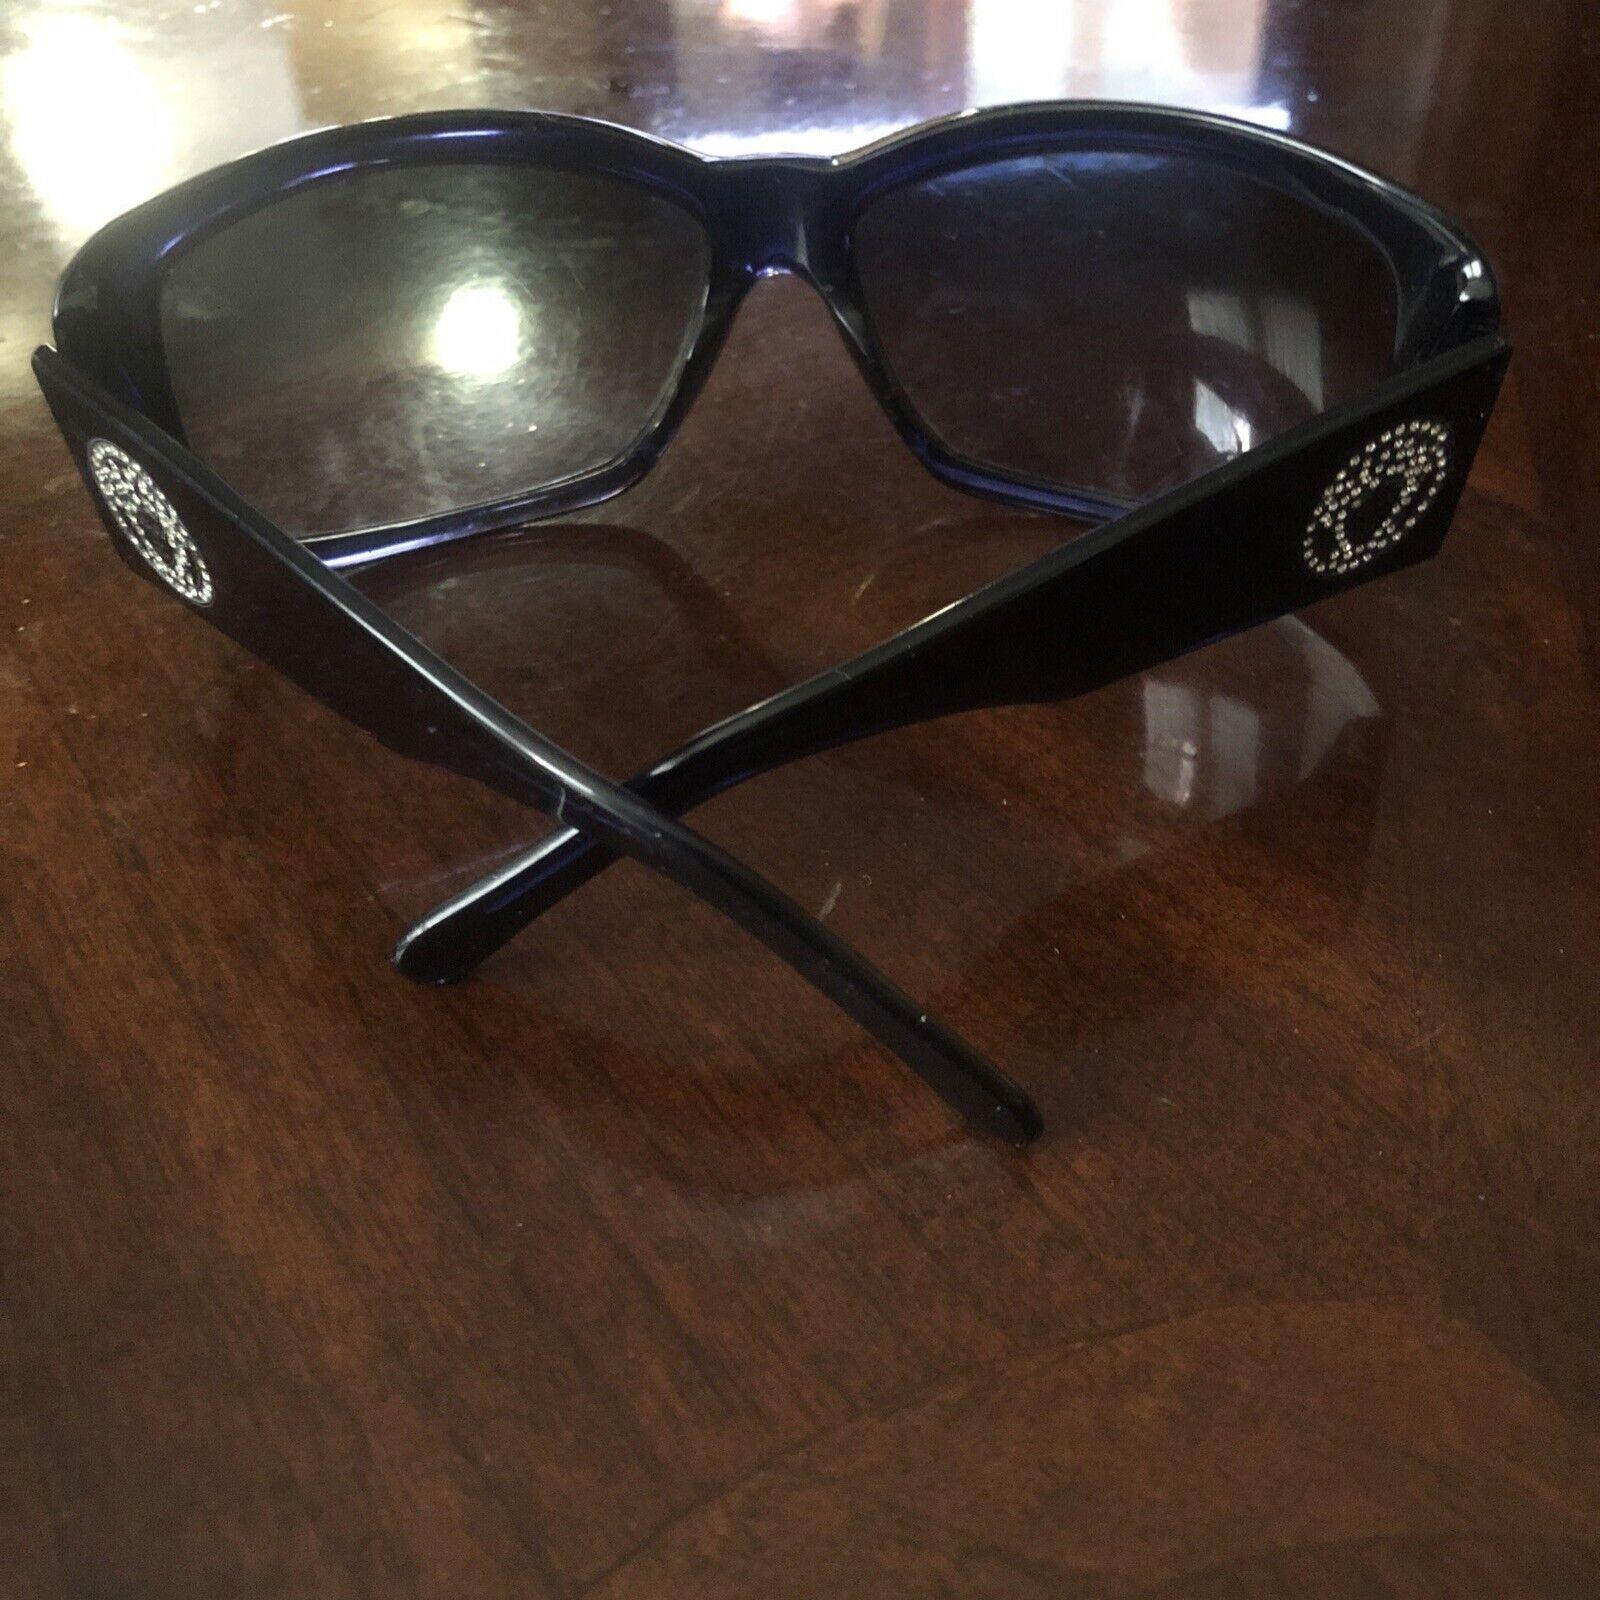 gianni versace sunglasses - image 3